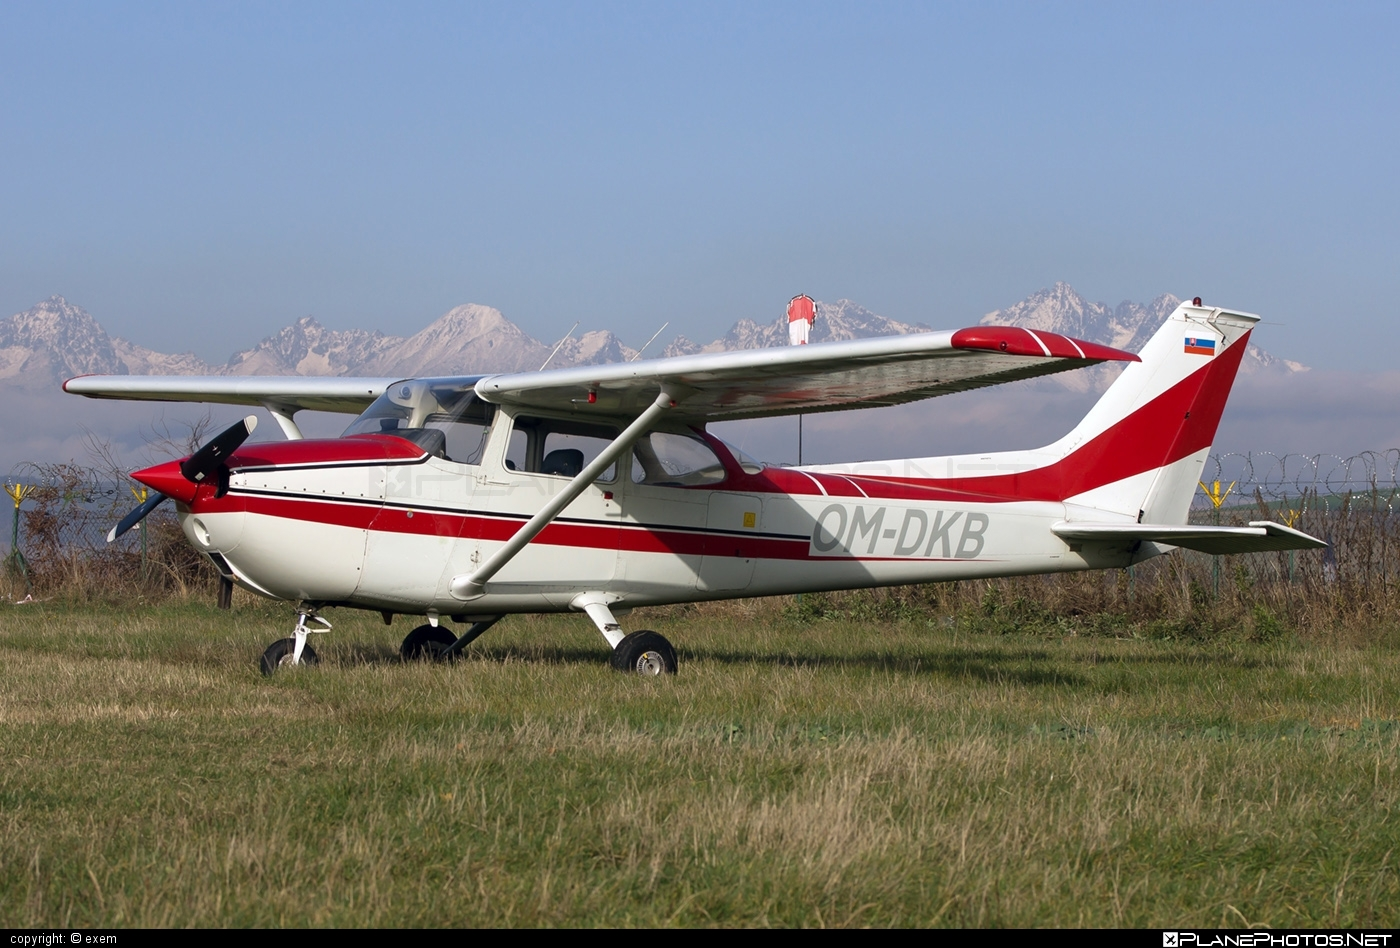 Reims F172M Skyhawk - OM-DKB operated by Private operator #cessna172 #cessnaskyhawk #f172m #reims #reims172 #reimsf172 #reimsskayhawk